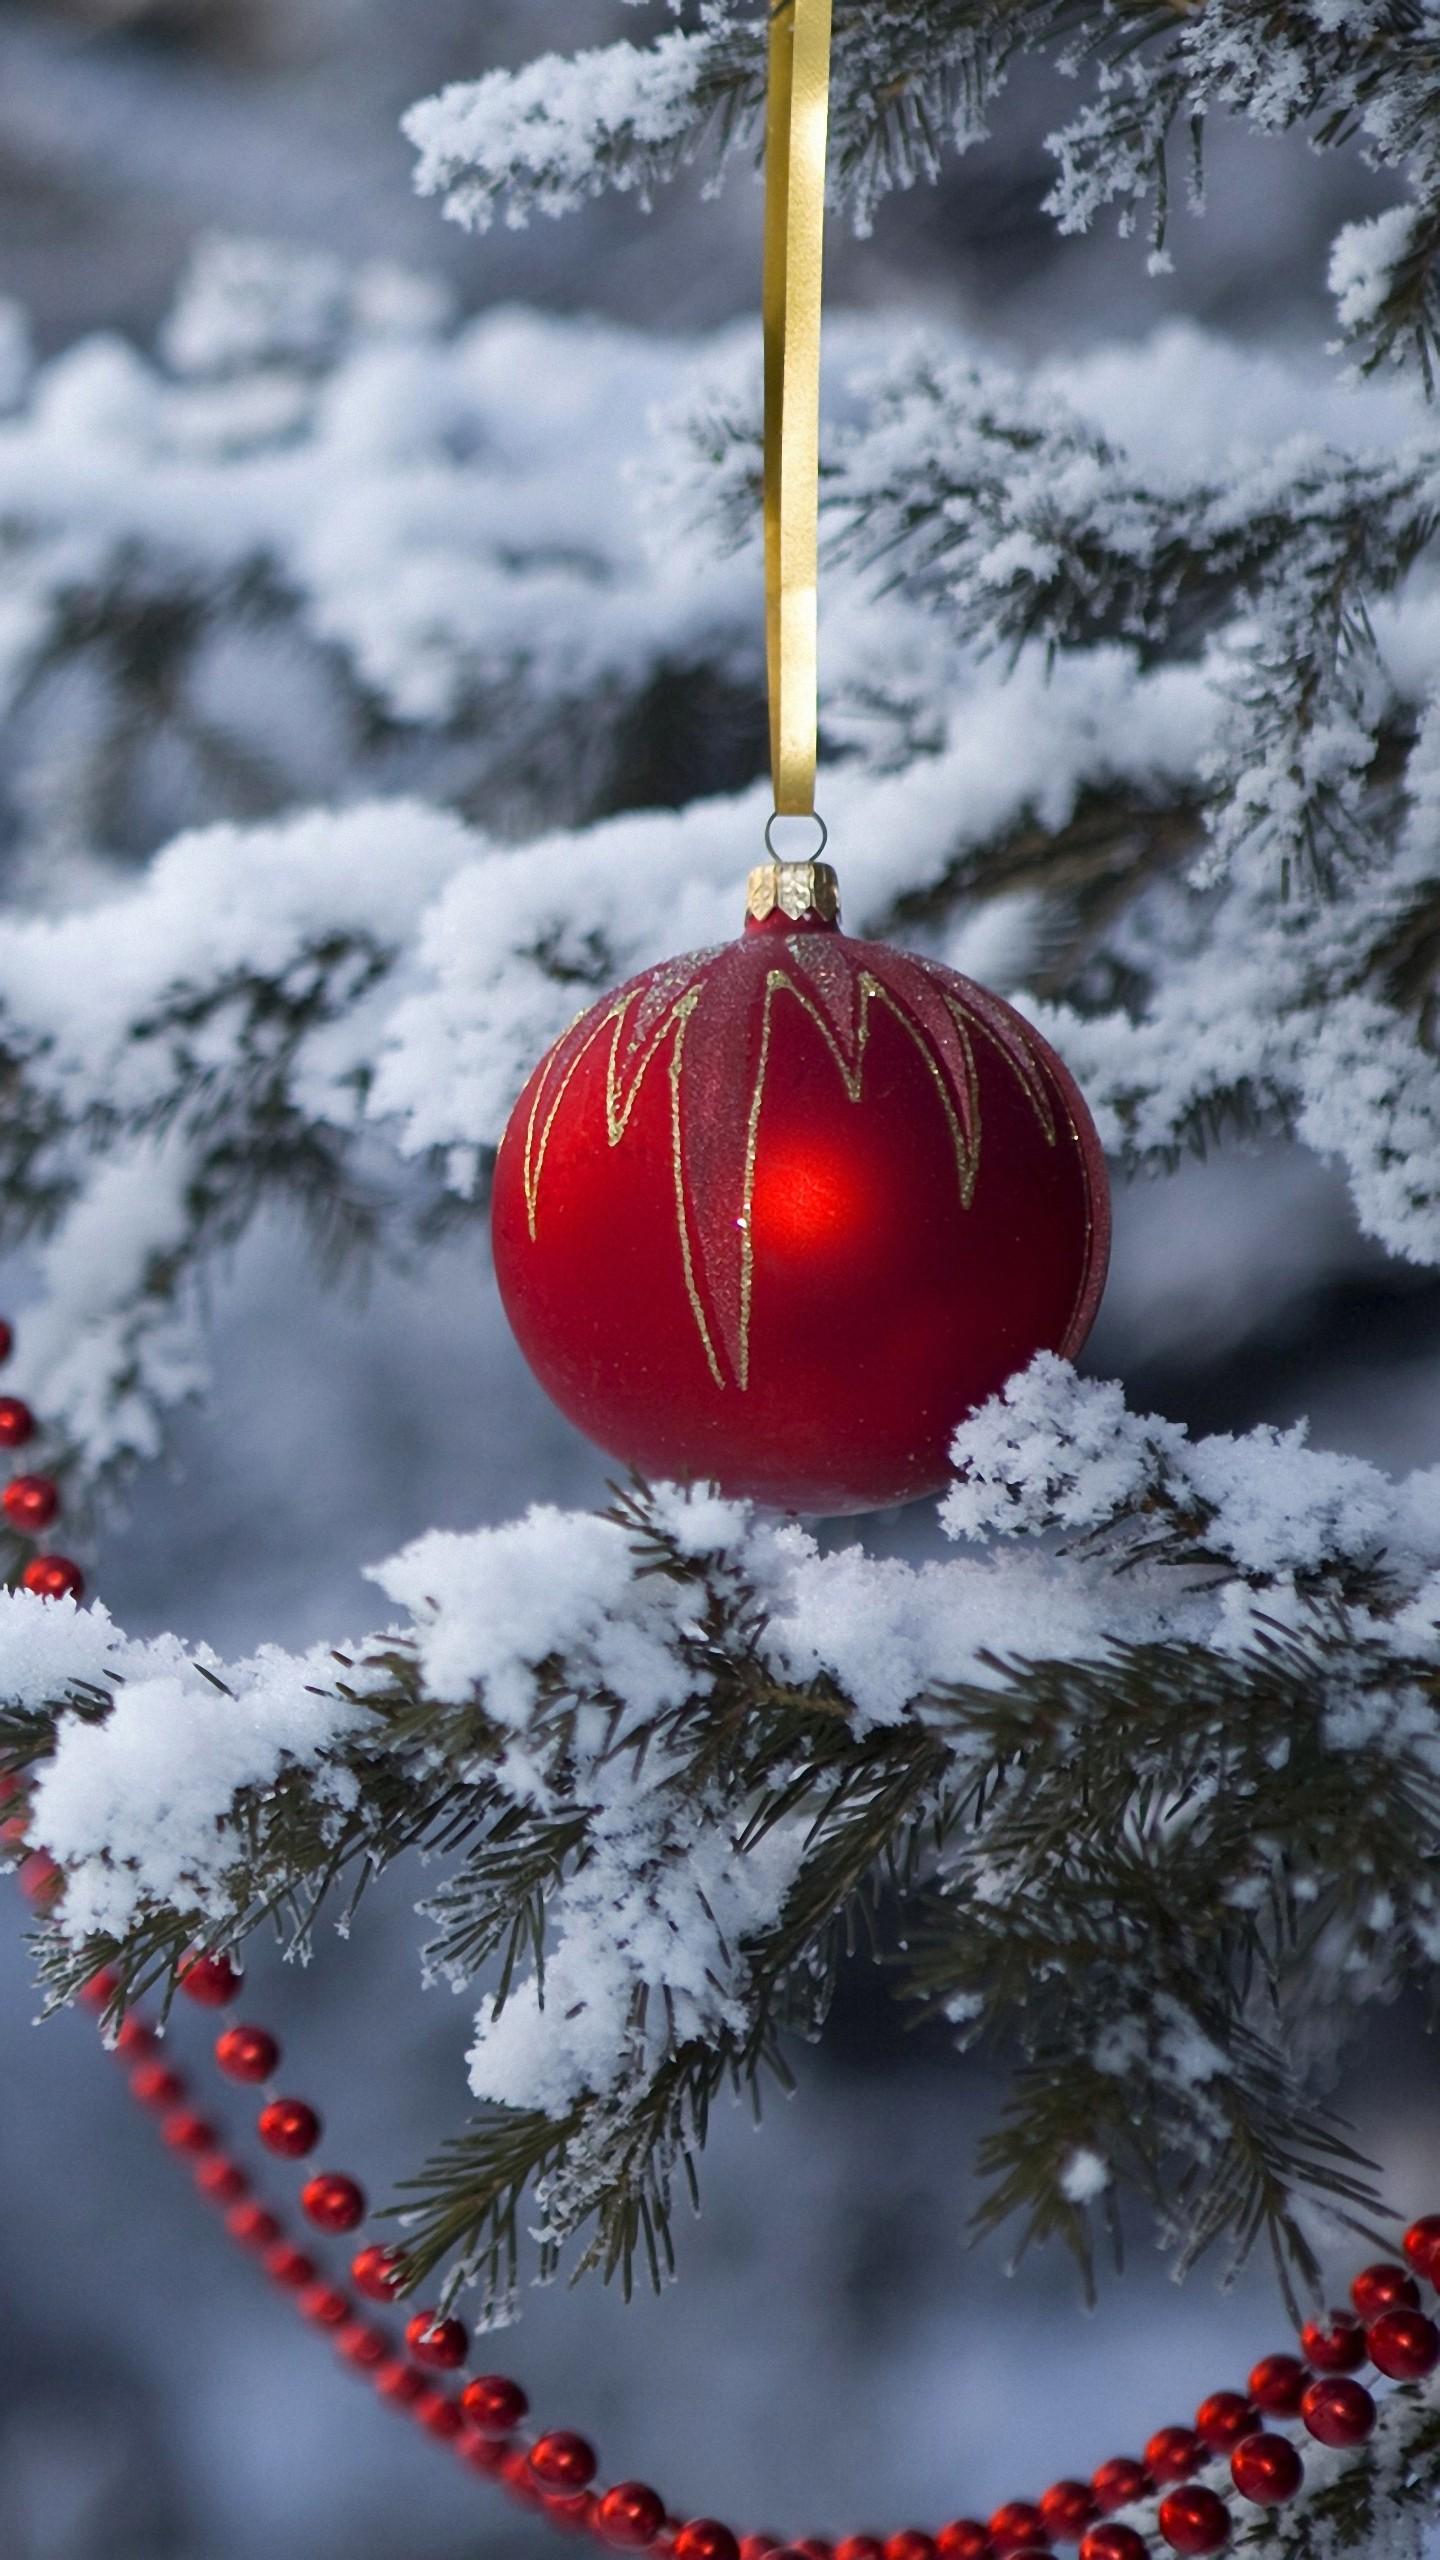 Christmas Tree Night Animated Gif